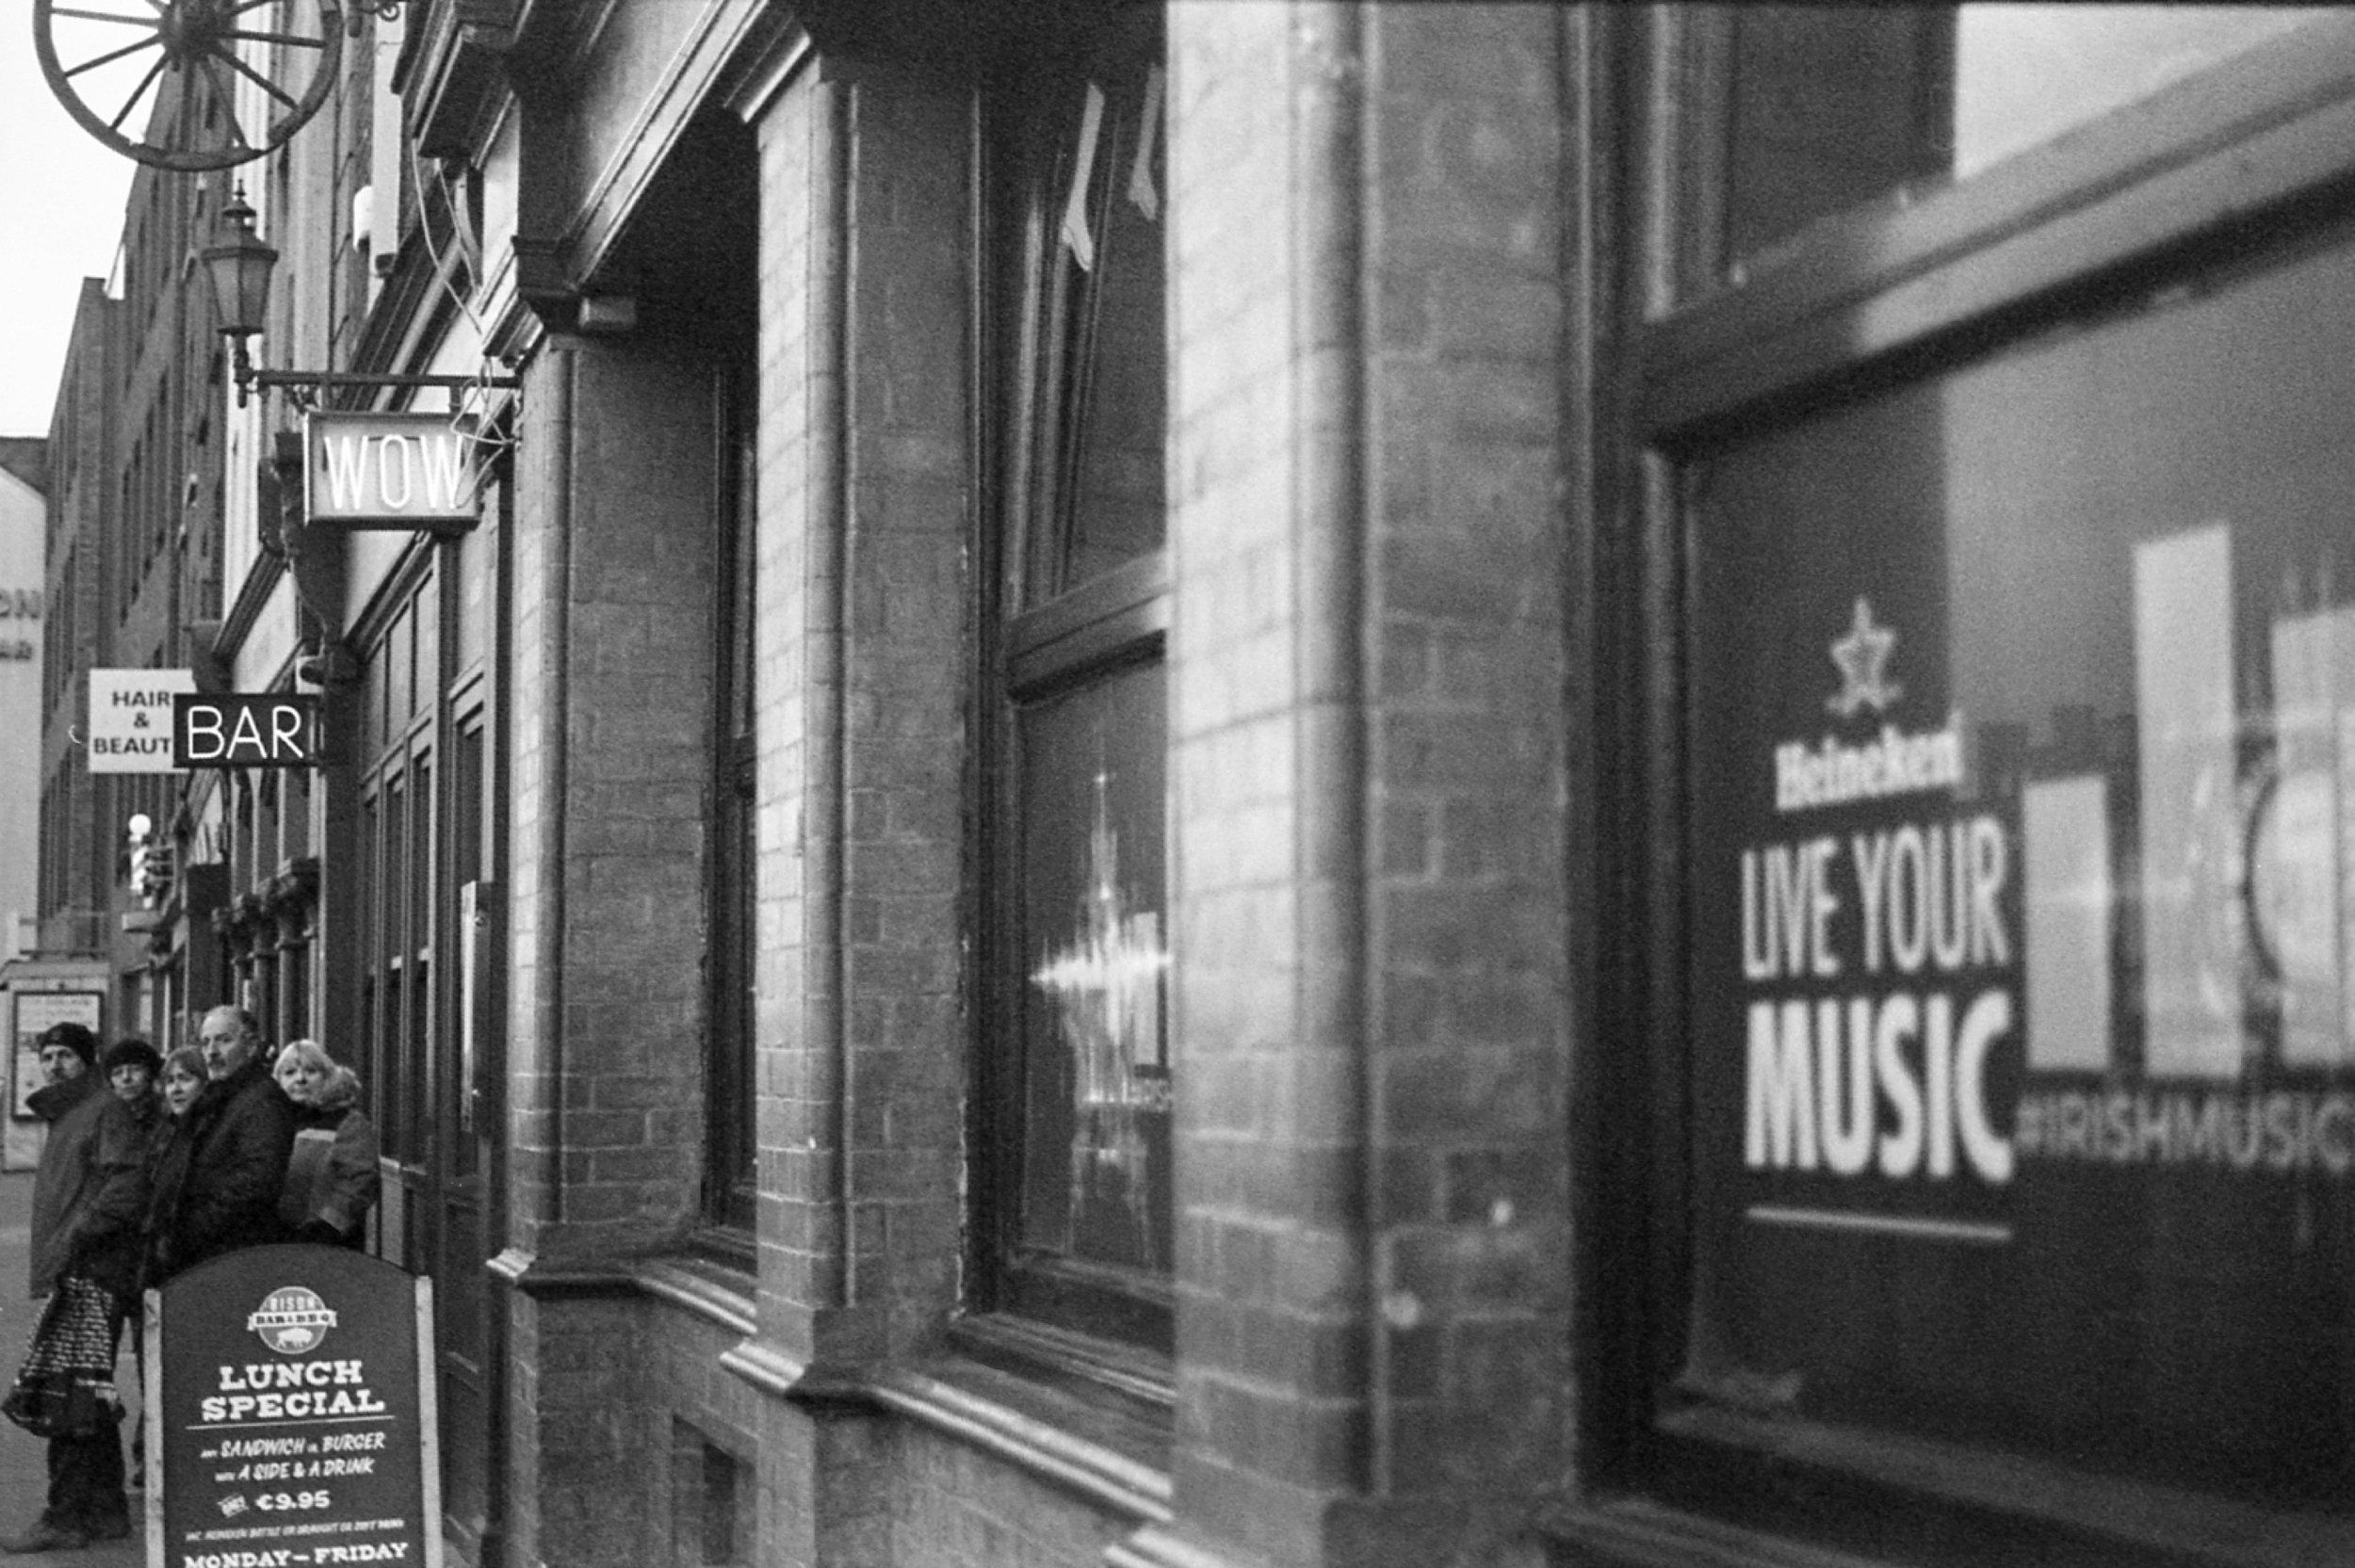 35mm Film Travel Photography in Dublin, Ireland